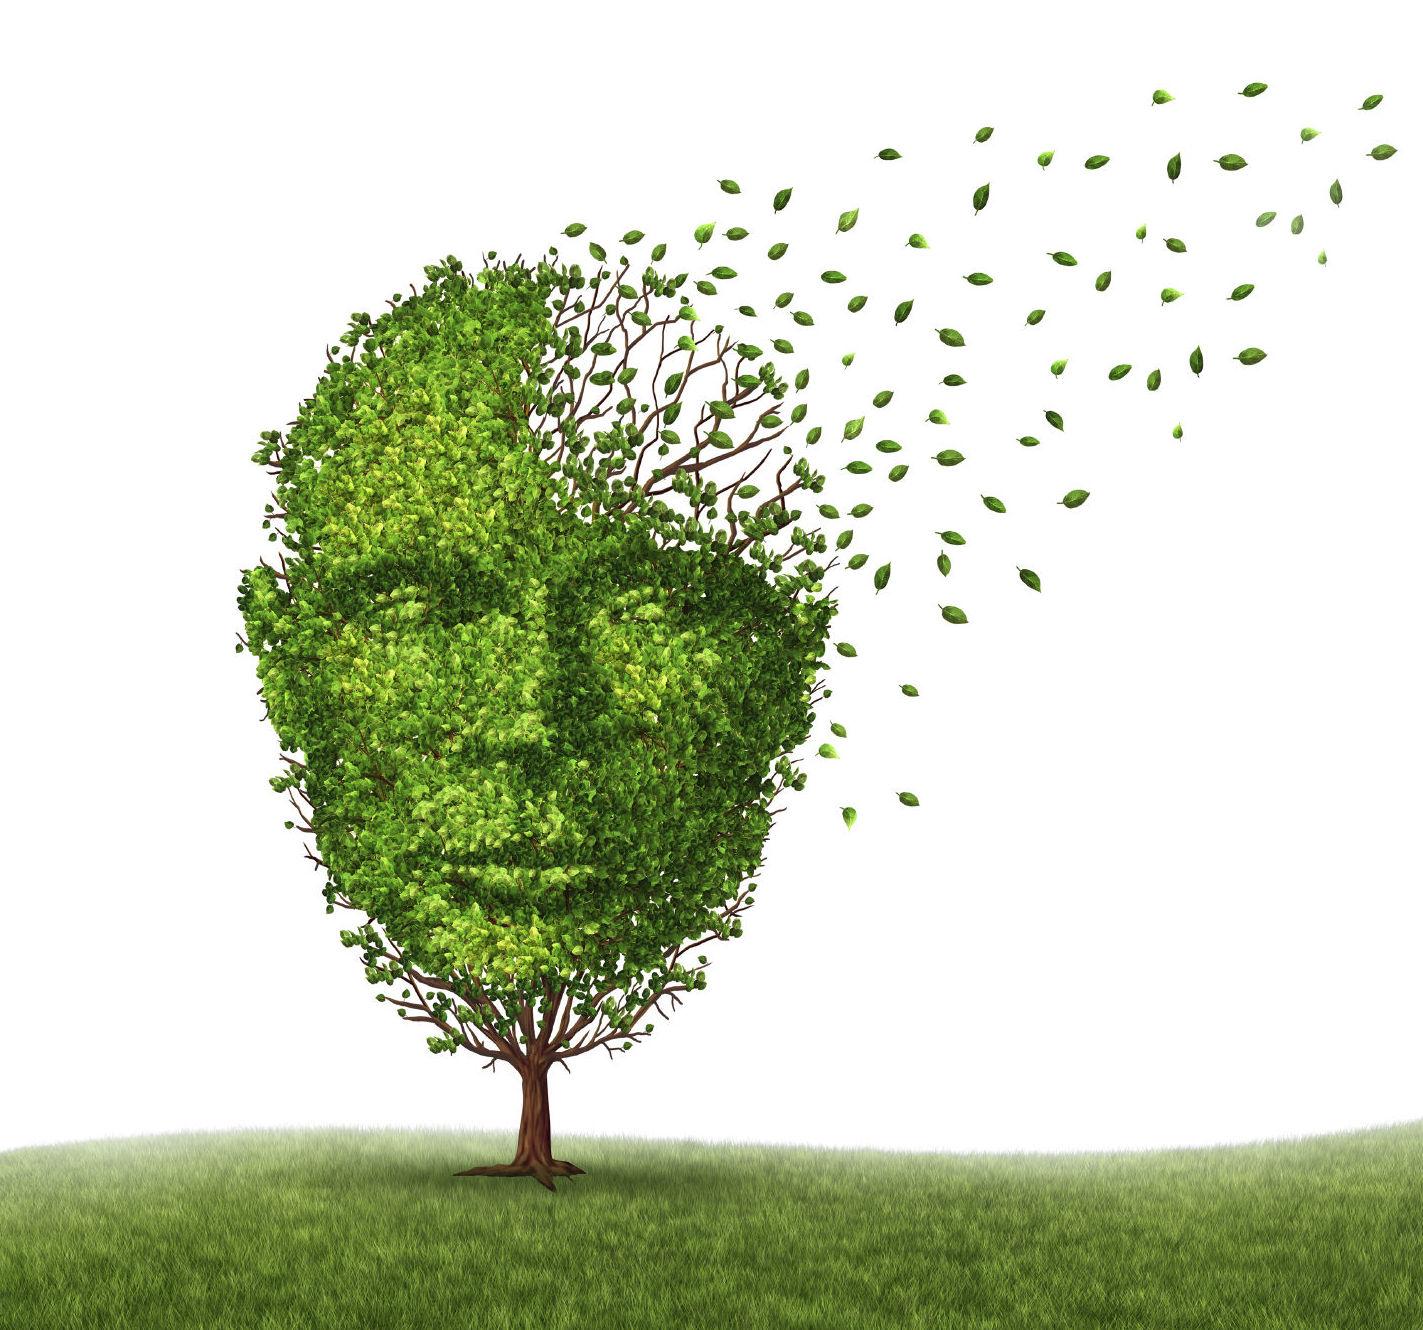 21 de septiembre Día Internacional del Alzheimer